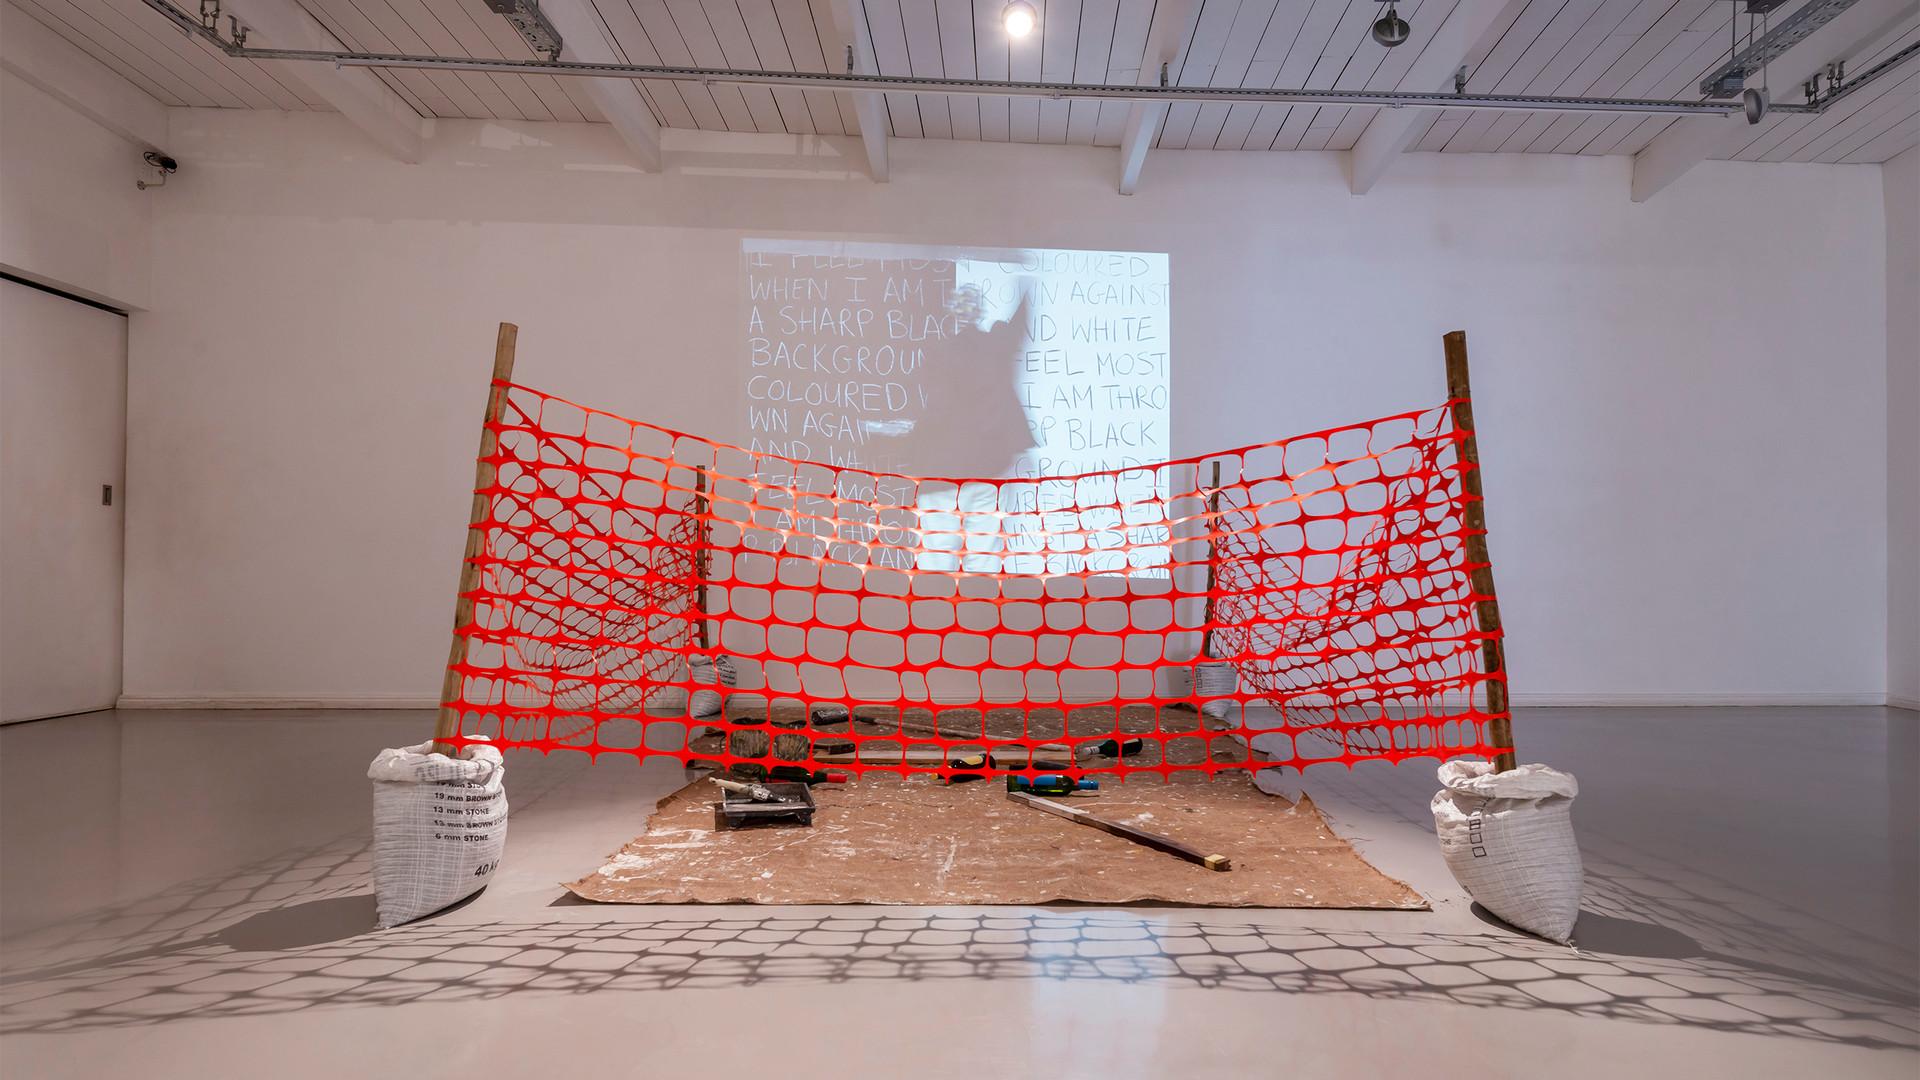 Rory Emmett | Reprise | 2020 | Installation View